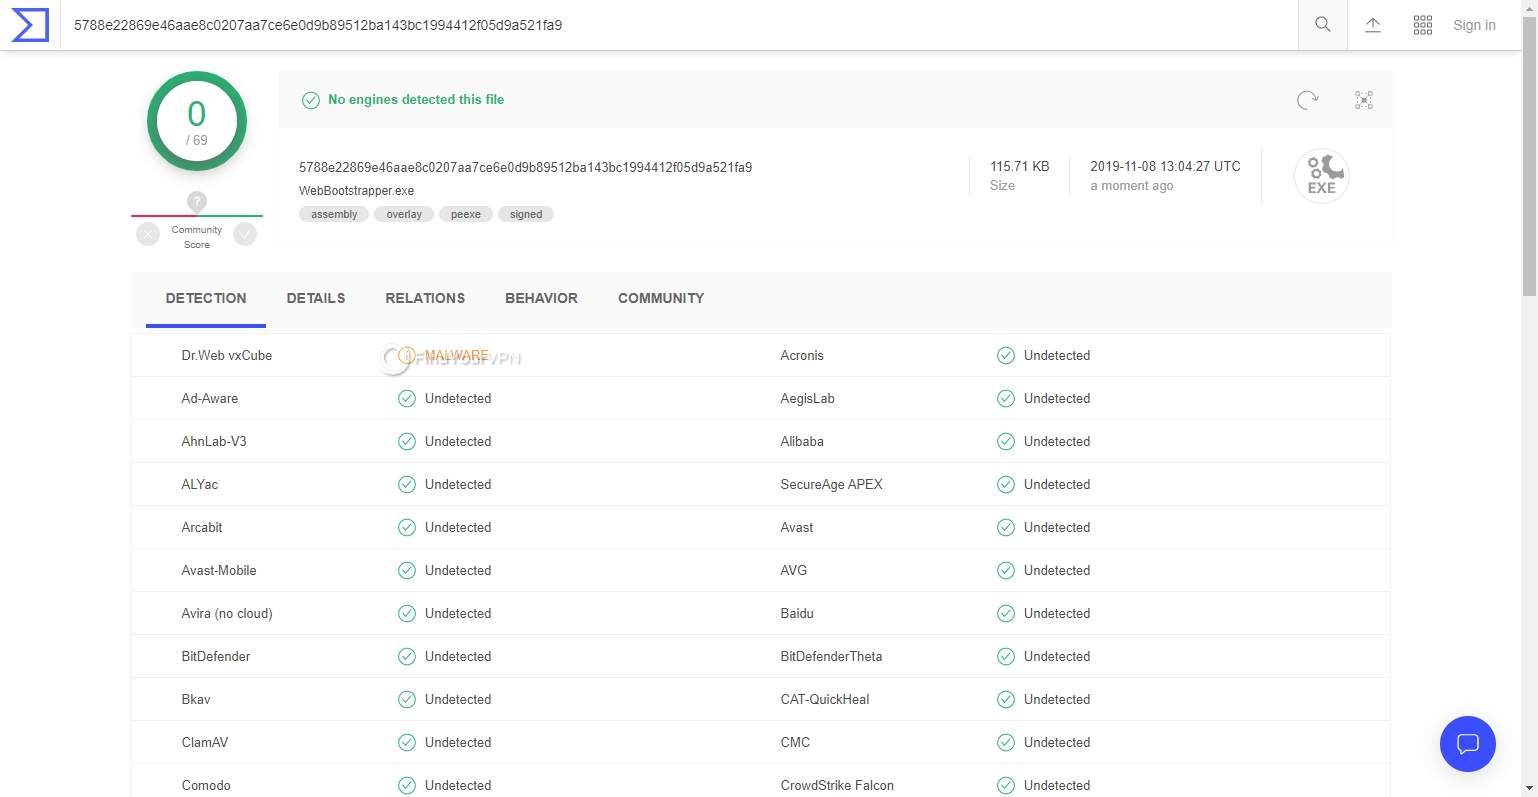 CyberGhost VPN's VirusTotal results